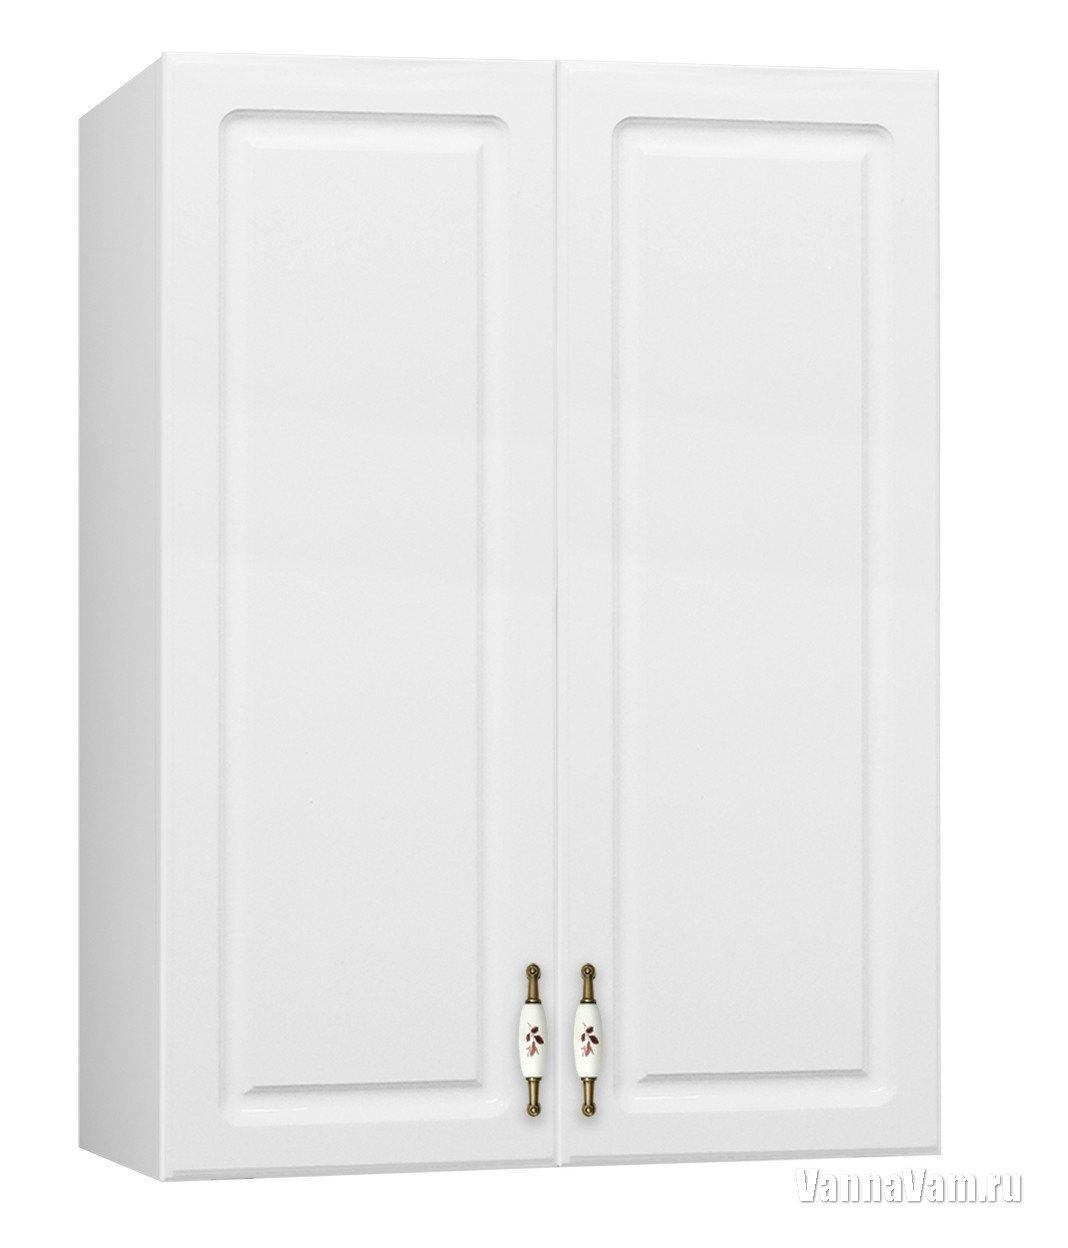 Подвесной шкаф Style Line Олеандр-2 60 ЛС-00000305